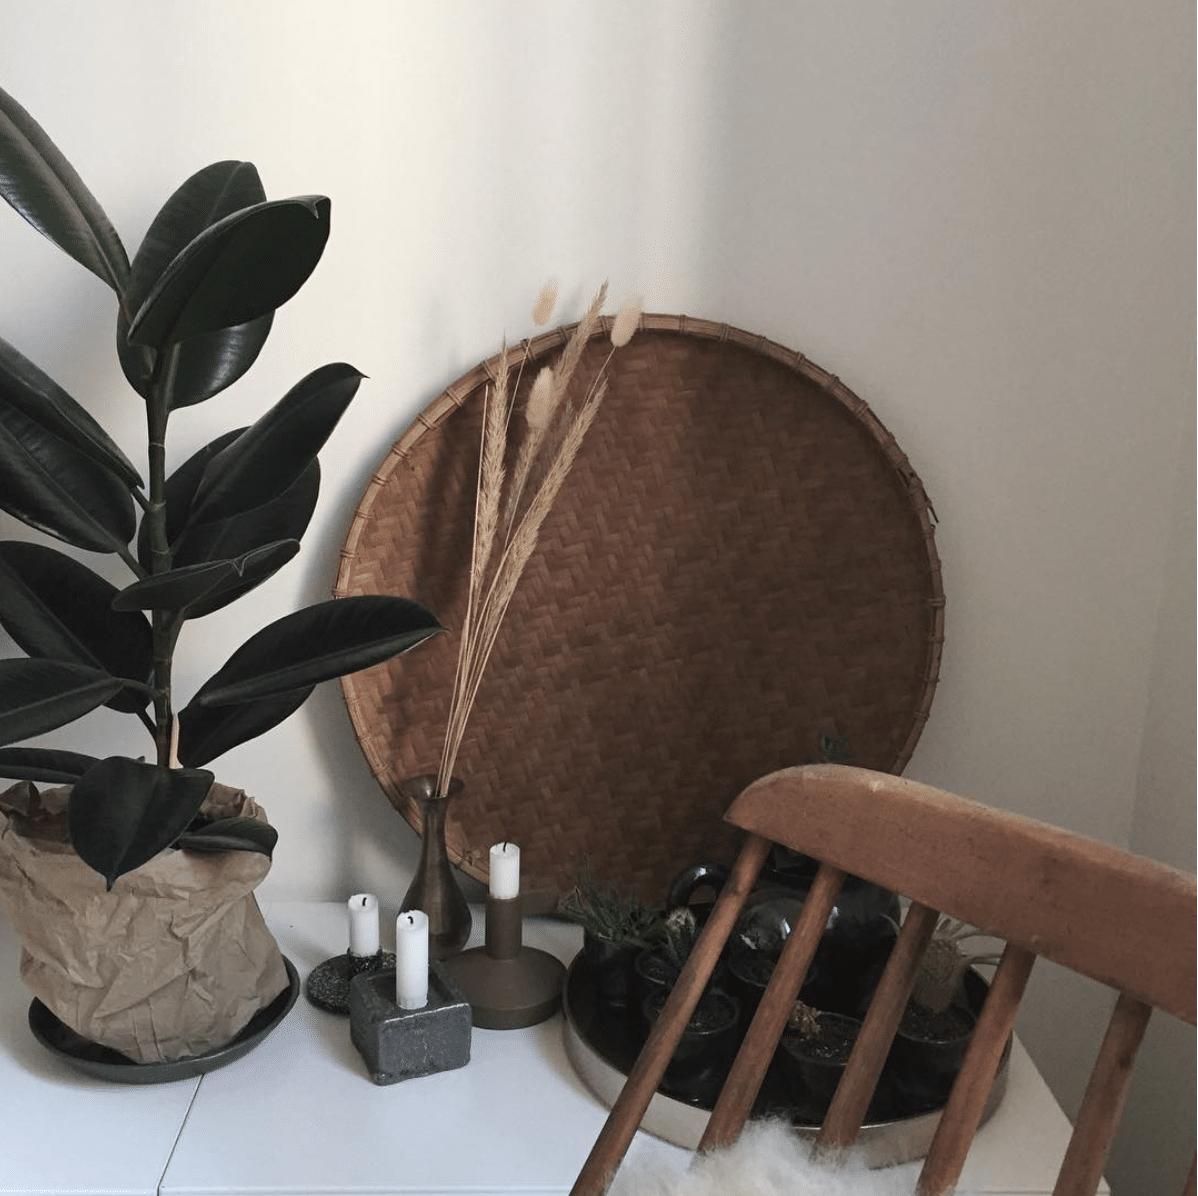 objets chinés wabi sabi minimaliste kinfolk